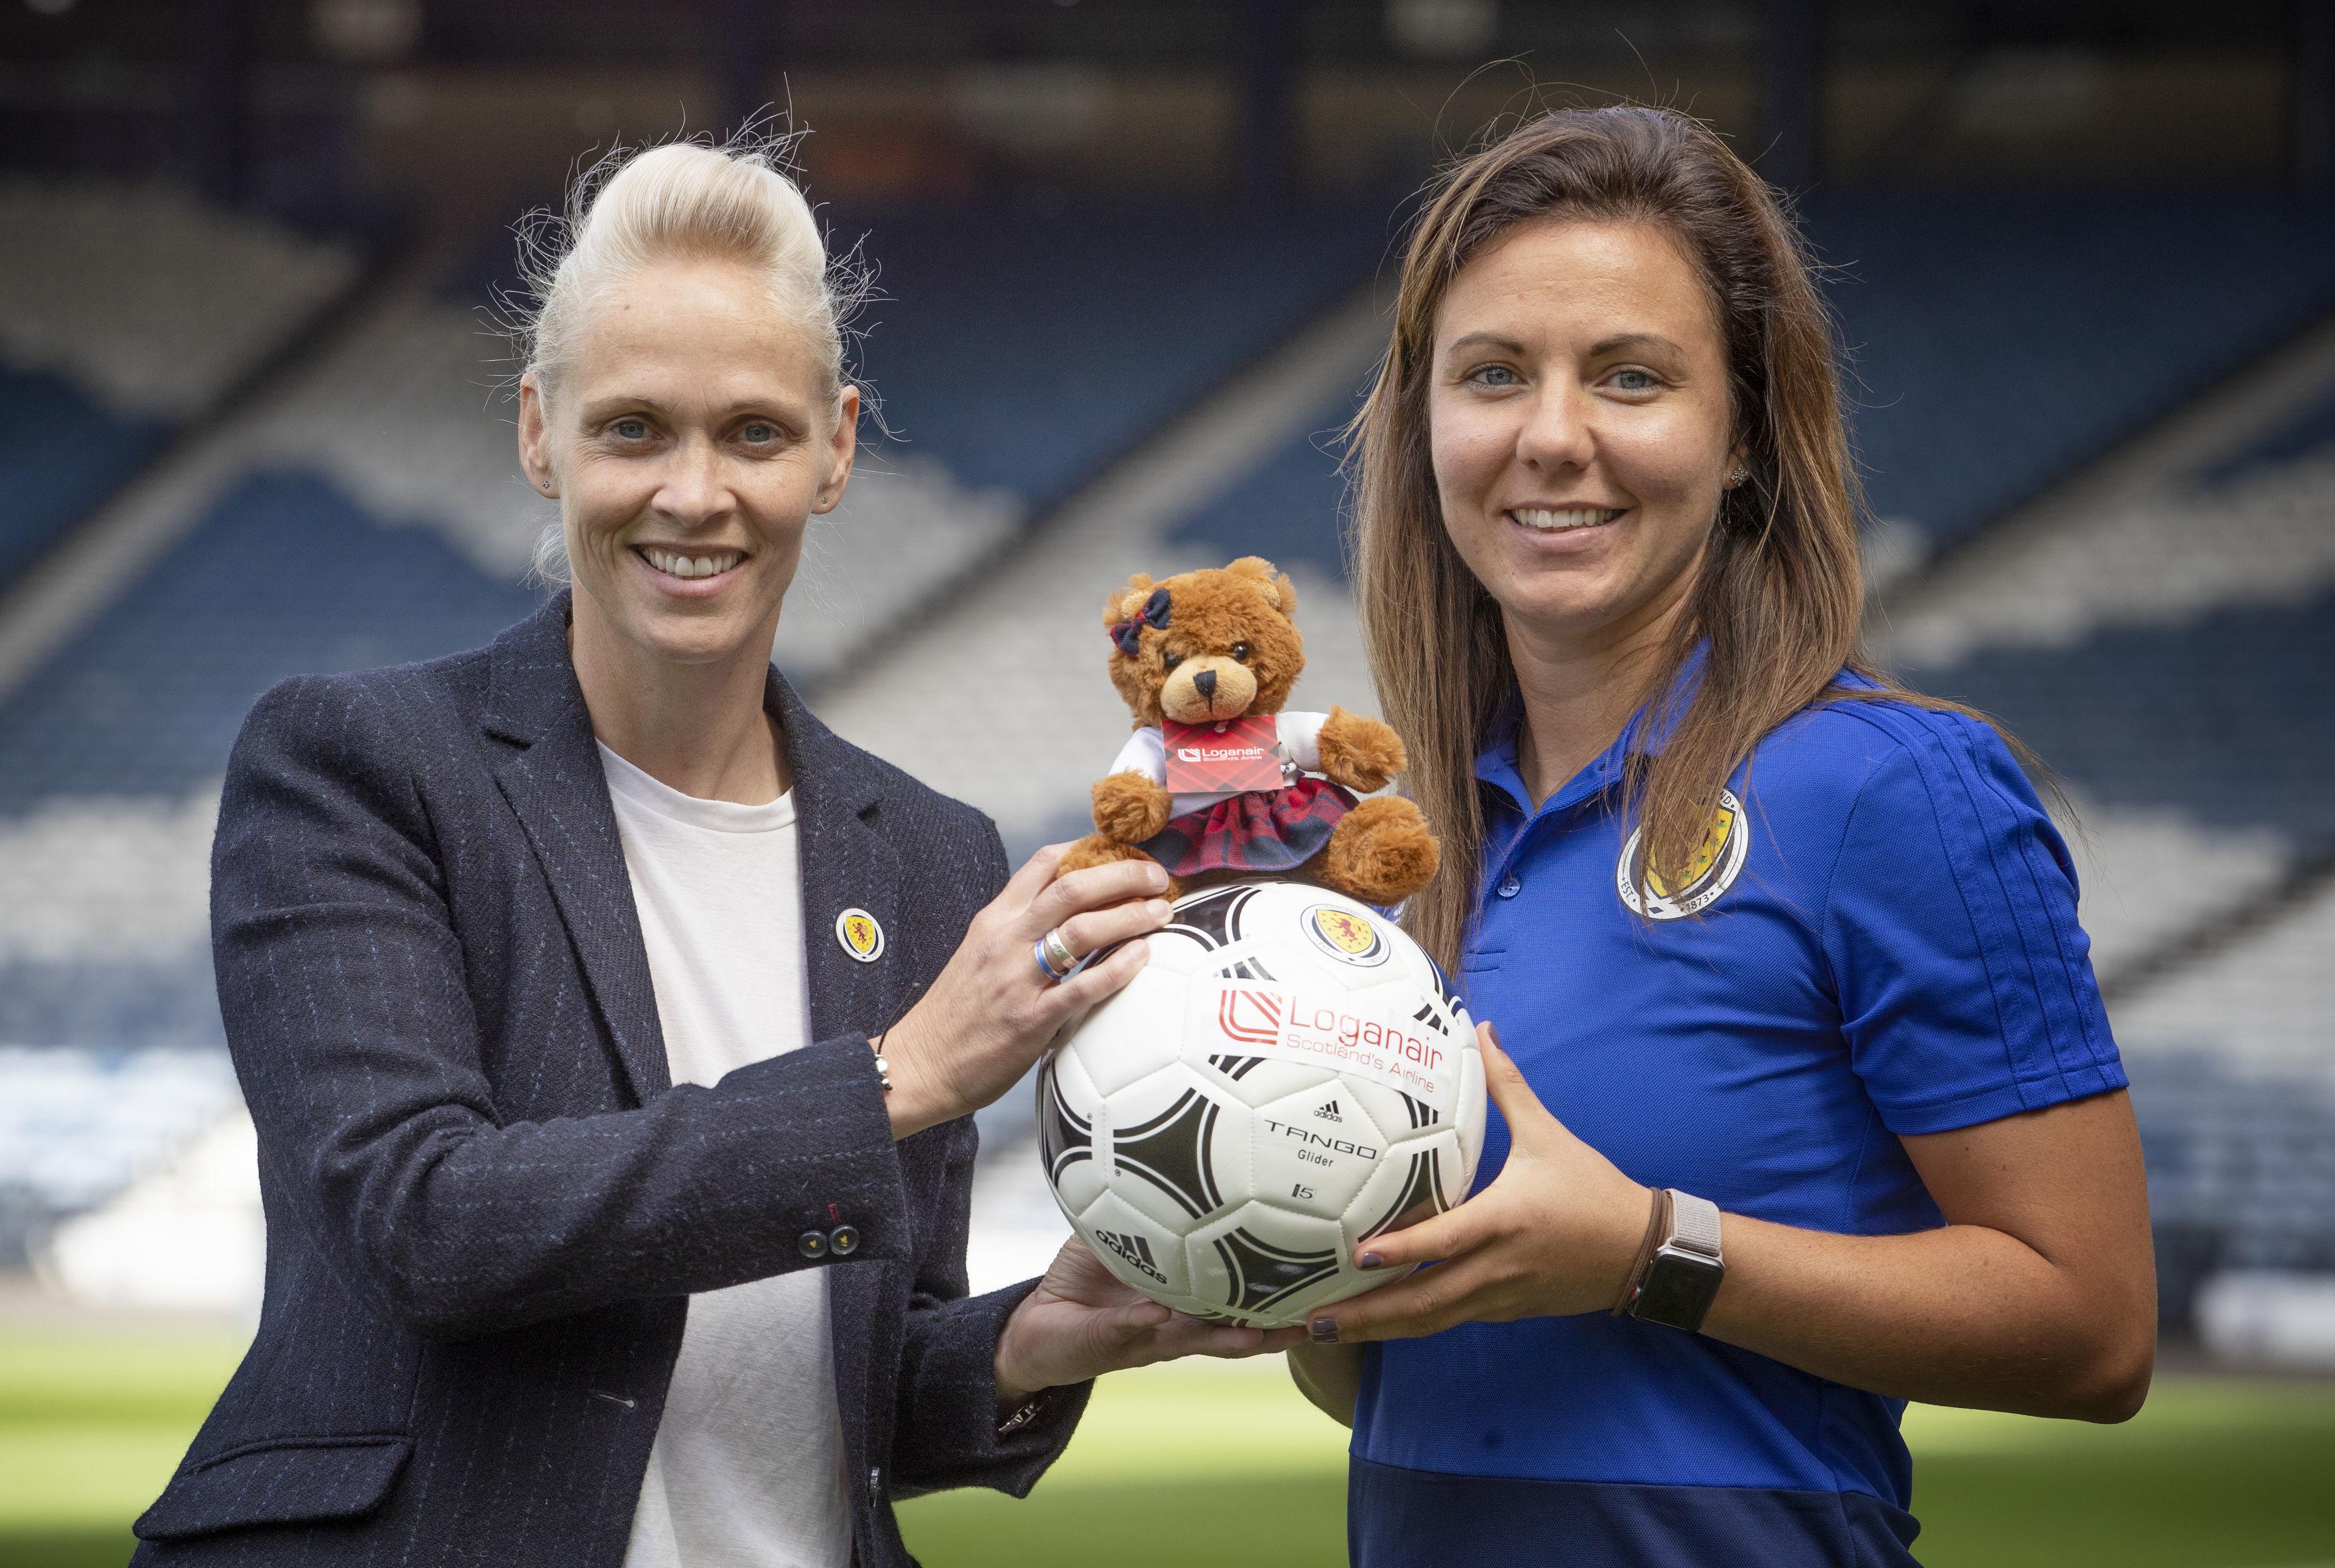 Scotland women's national team manager Shelley Kerr (left) and captain Rachel Corsie